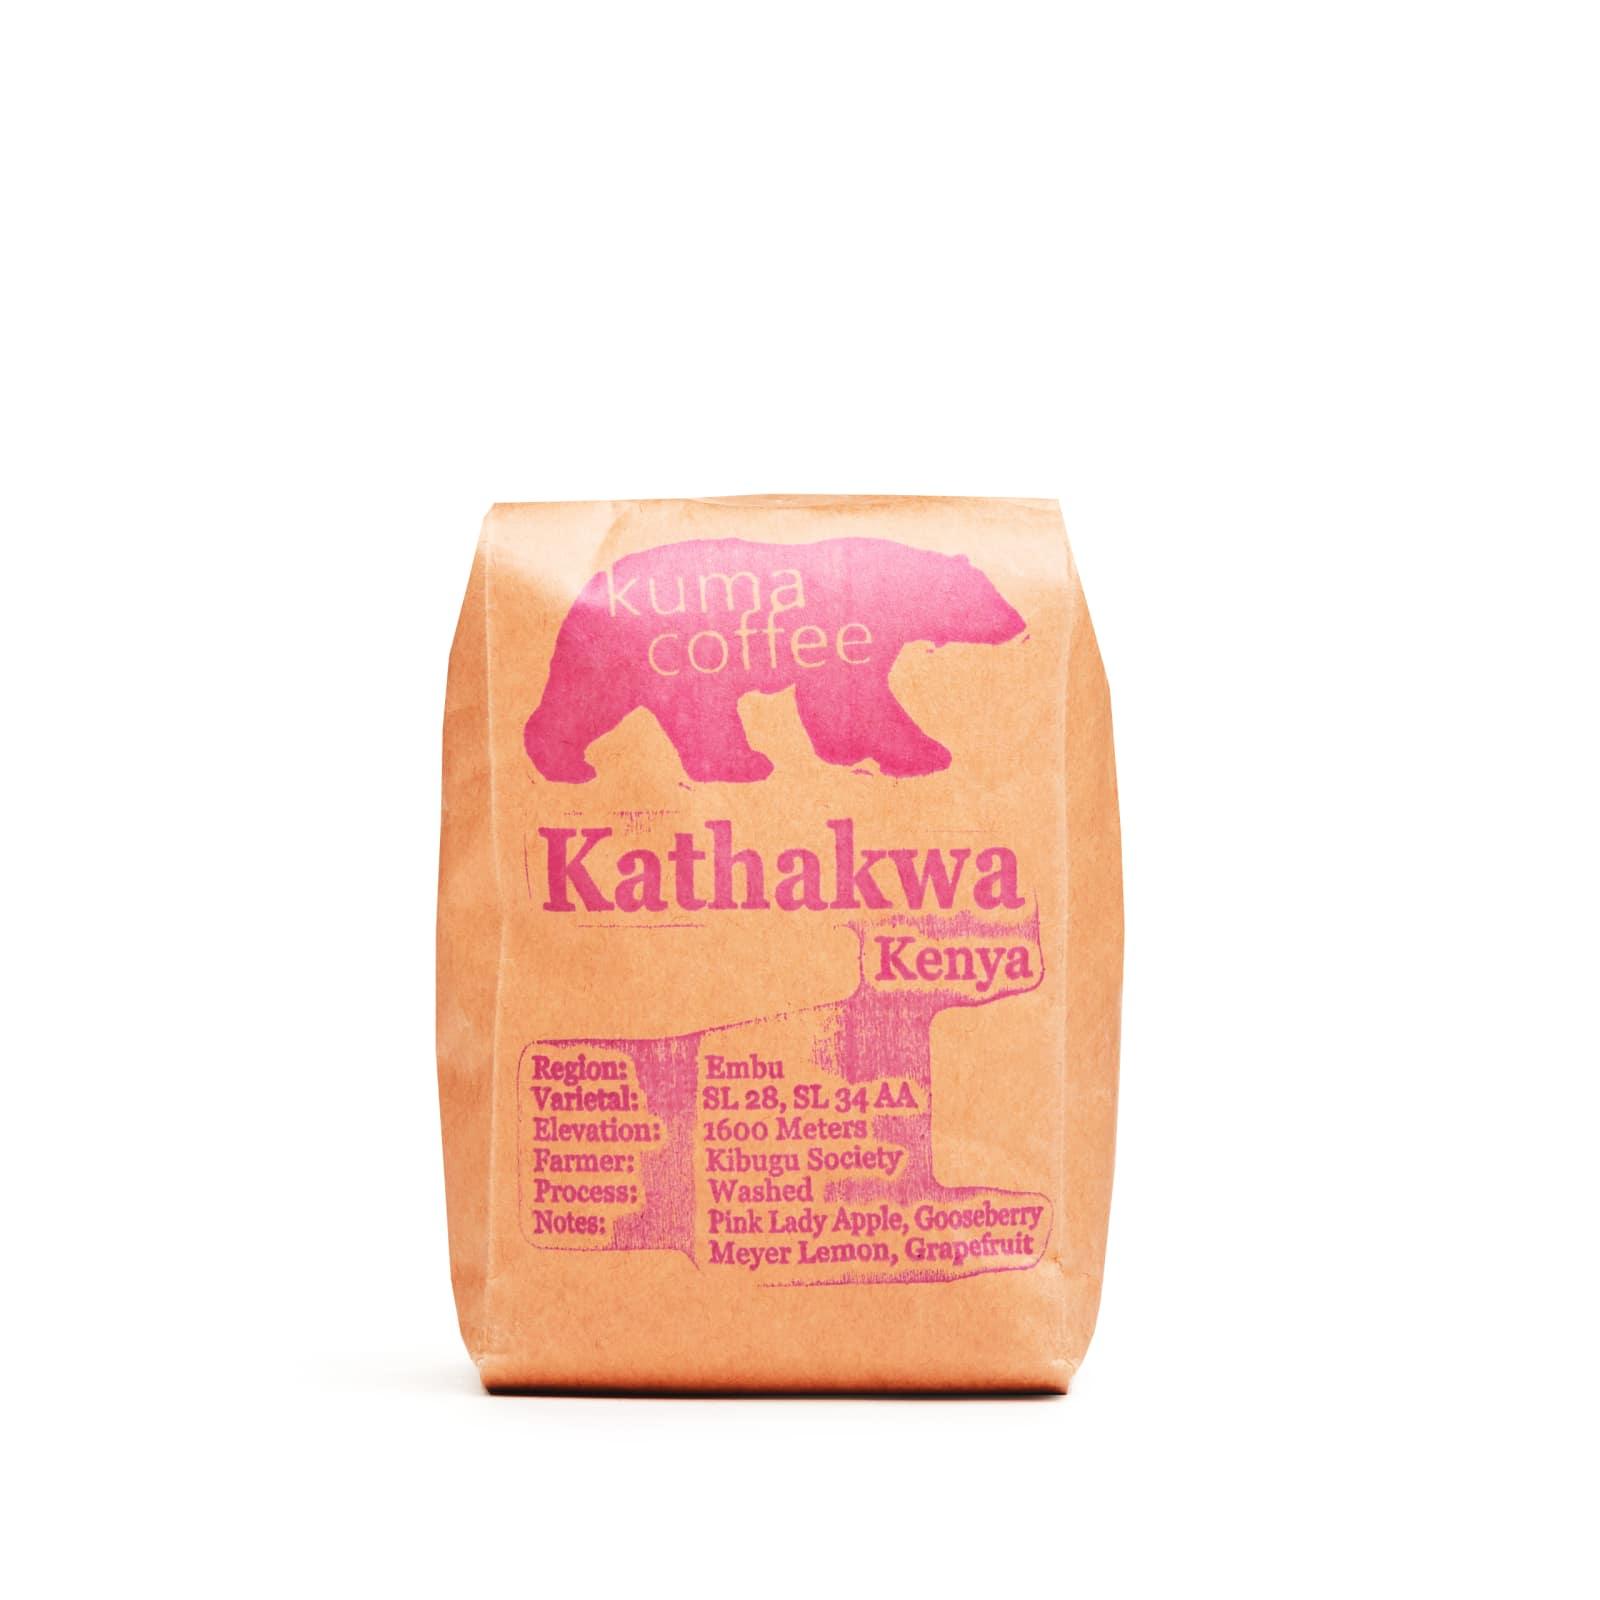 Kenya Kathakwa